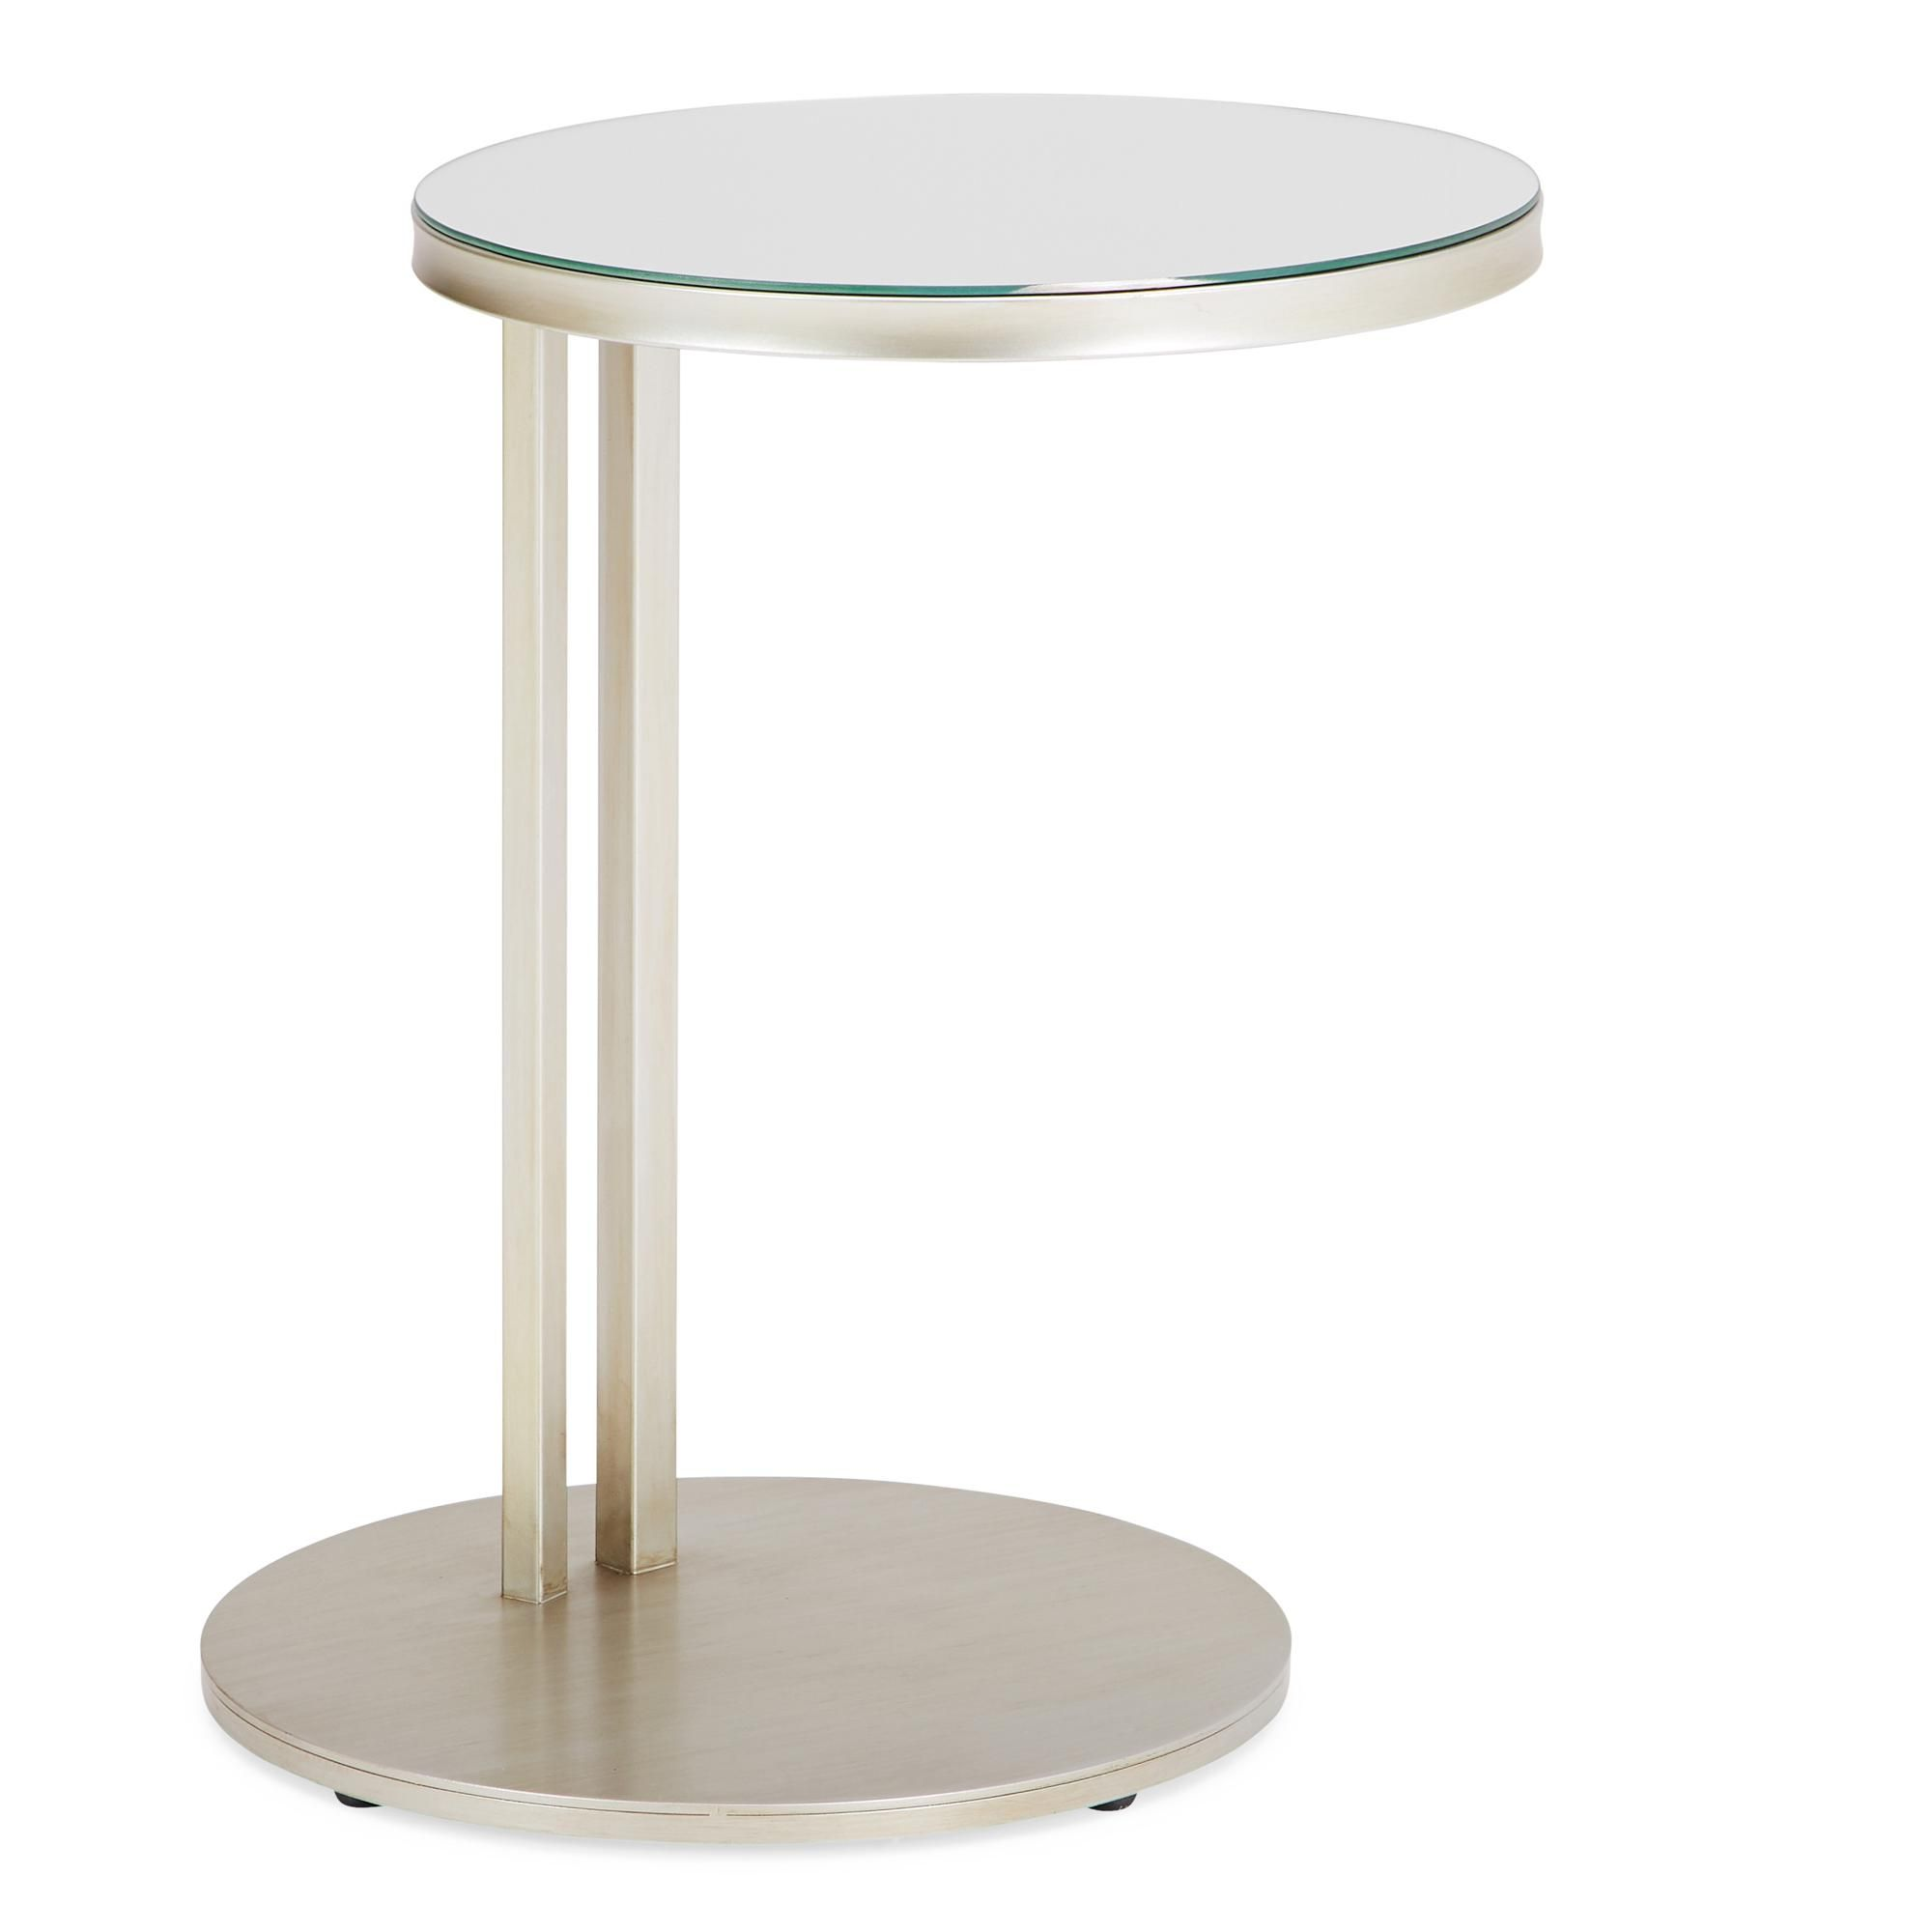 Mara Round Side Table Round Side Table Table Side Table Decor